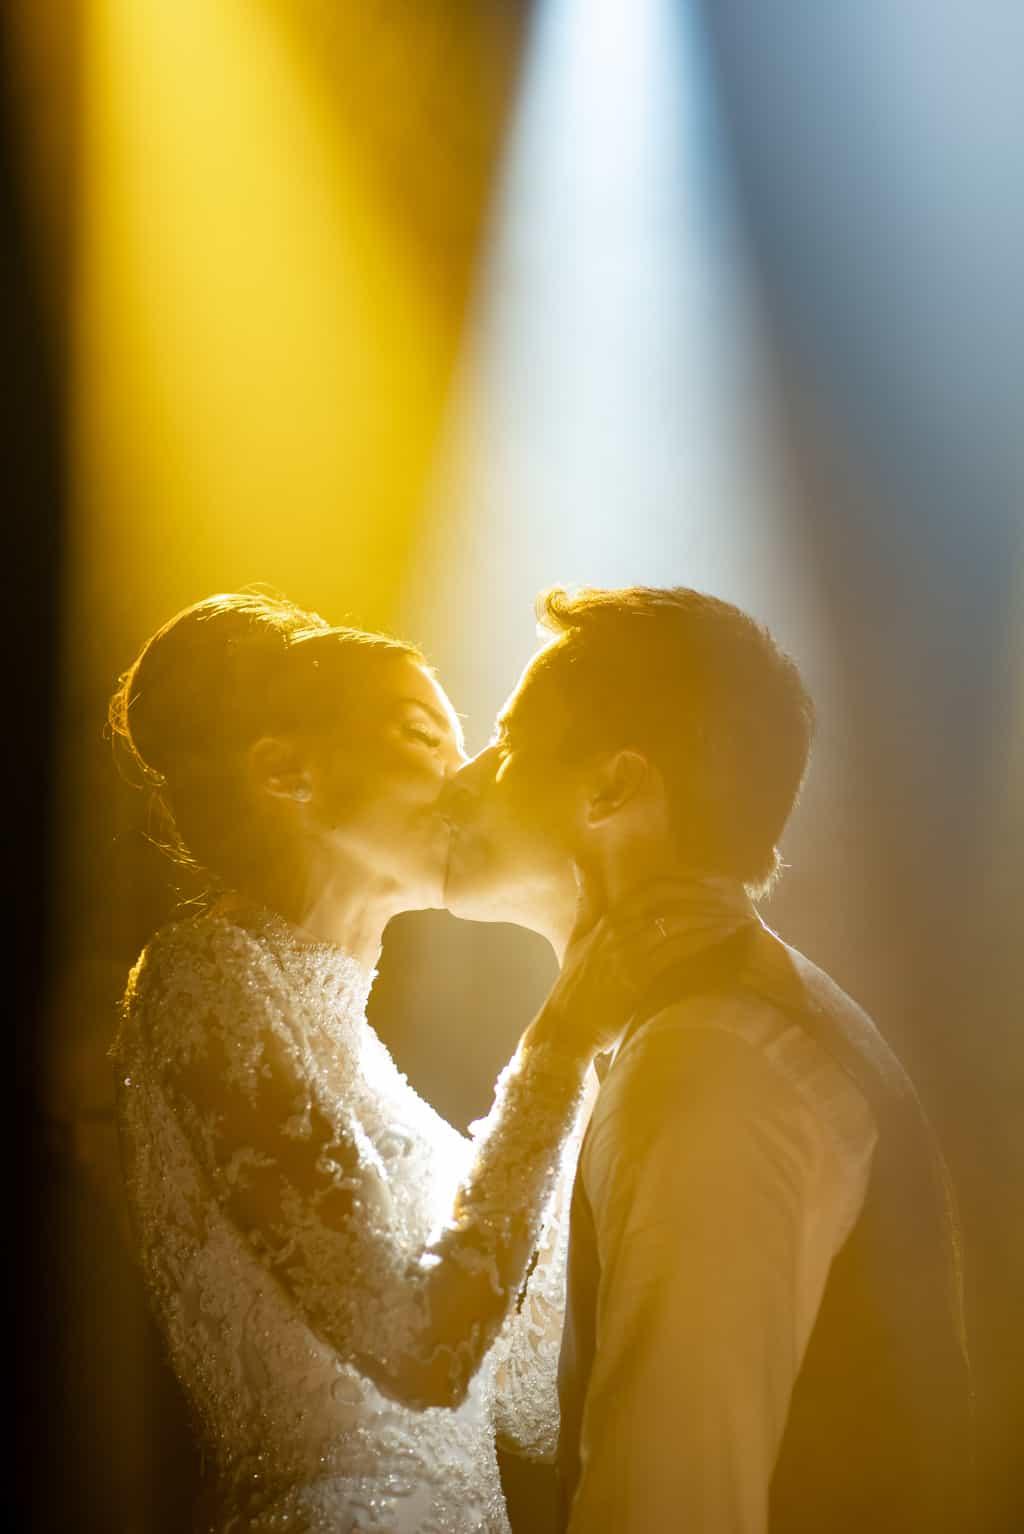 casamento-Patricia-e-Thiago-Copacabana-Palace-Daniel-Curz-A-Roseira-Paula-Rocha-Marina-Fava-festa2001-Patricia-e-Thiago-WAL_4906